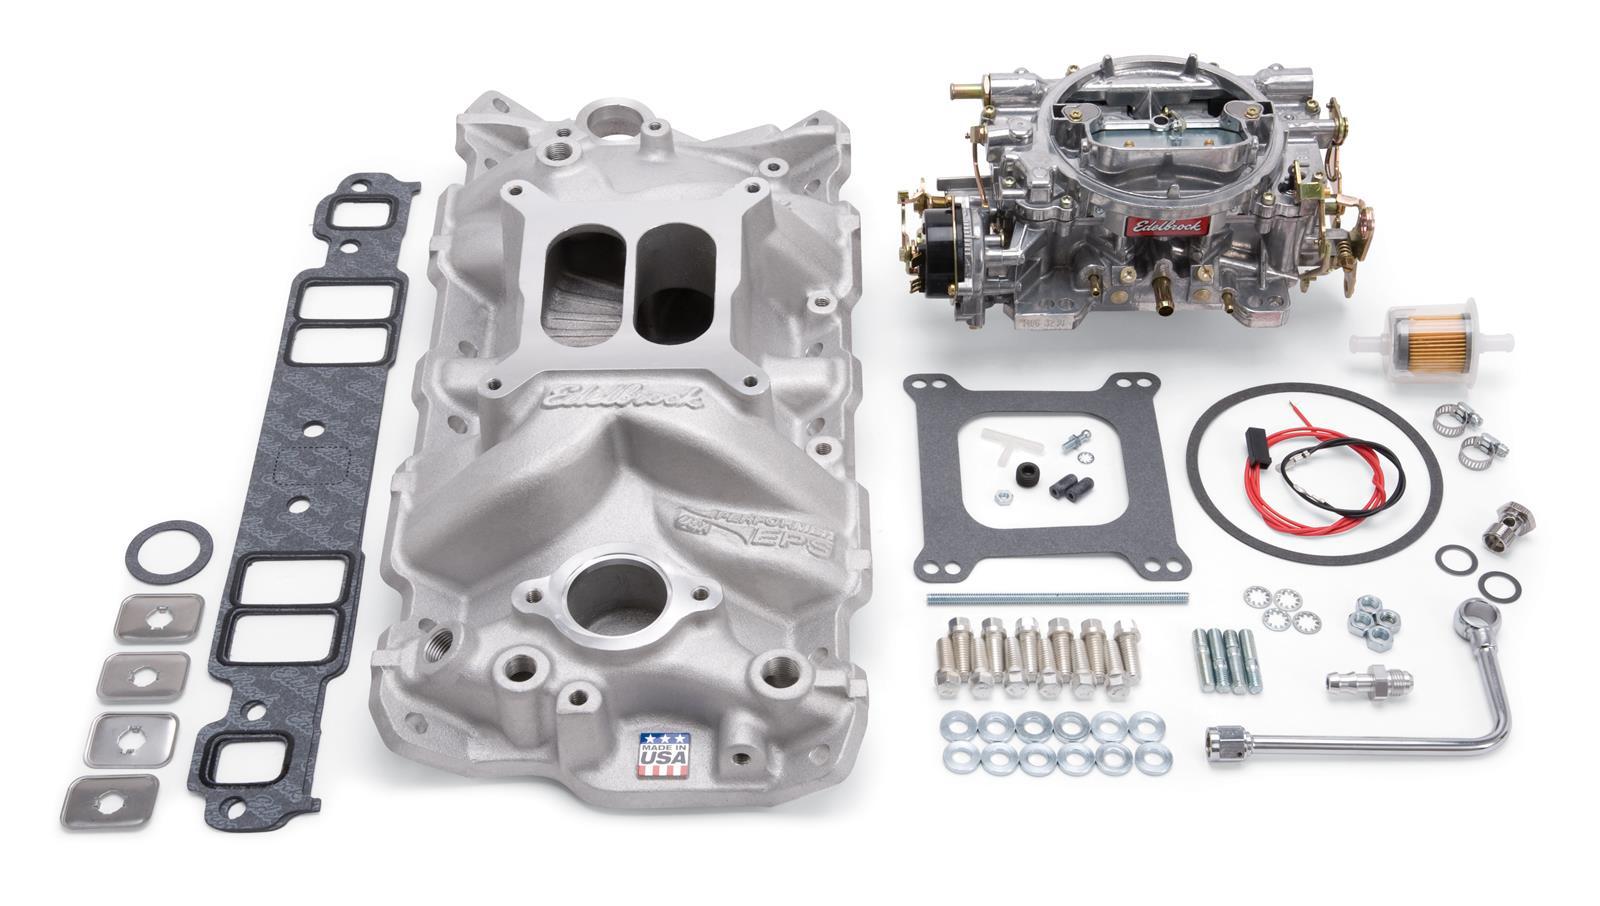 Edelbrock Performer EPS Intake Manifold and Carburetor Kits 2021